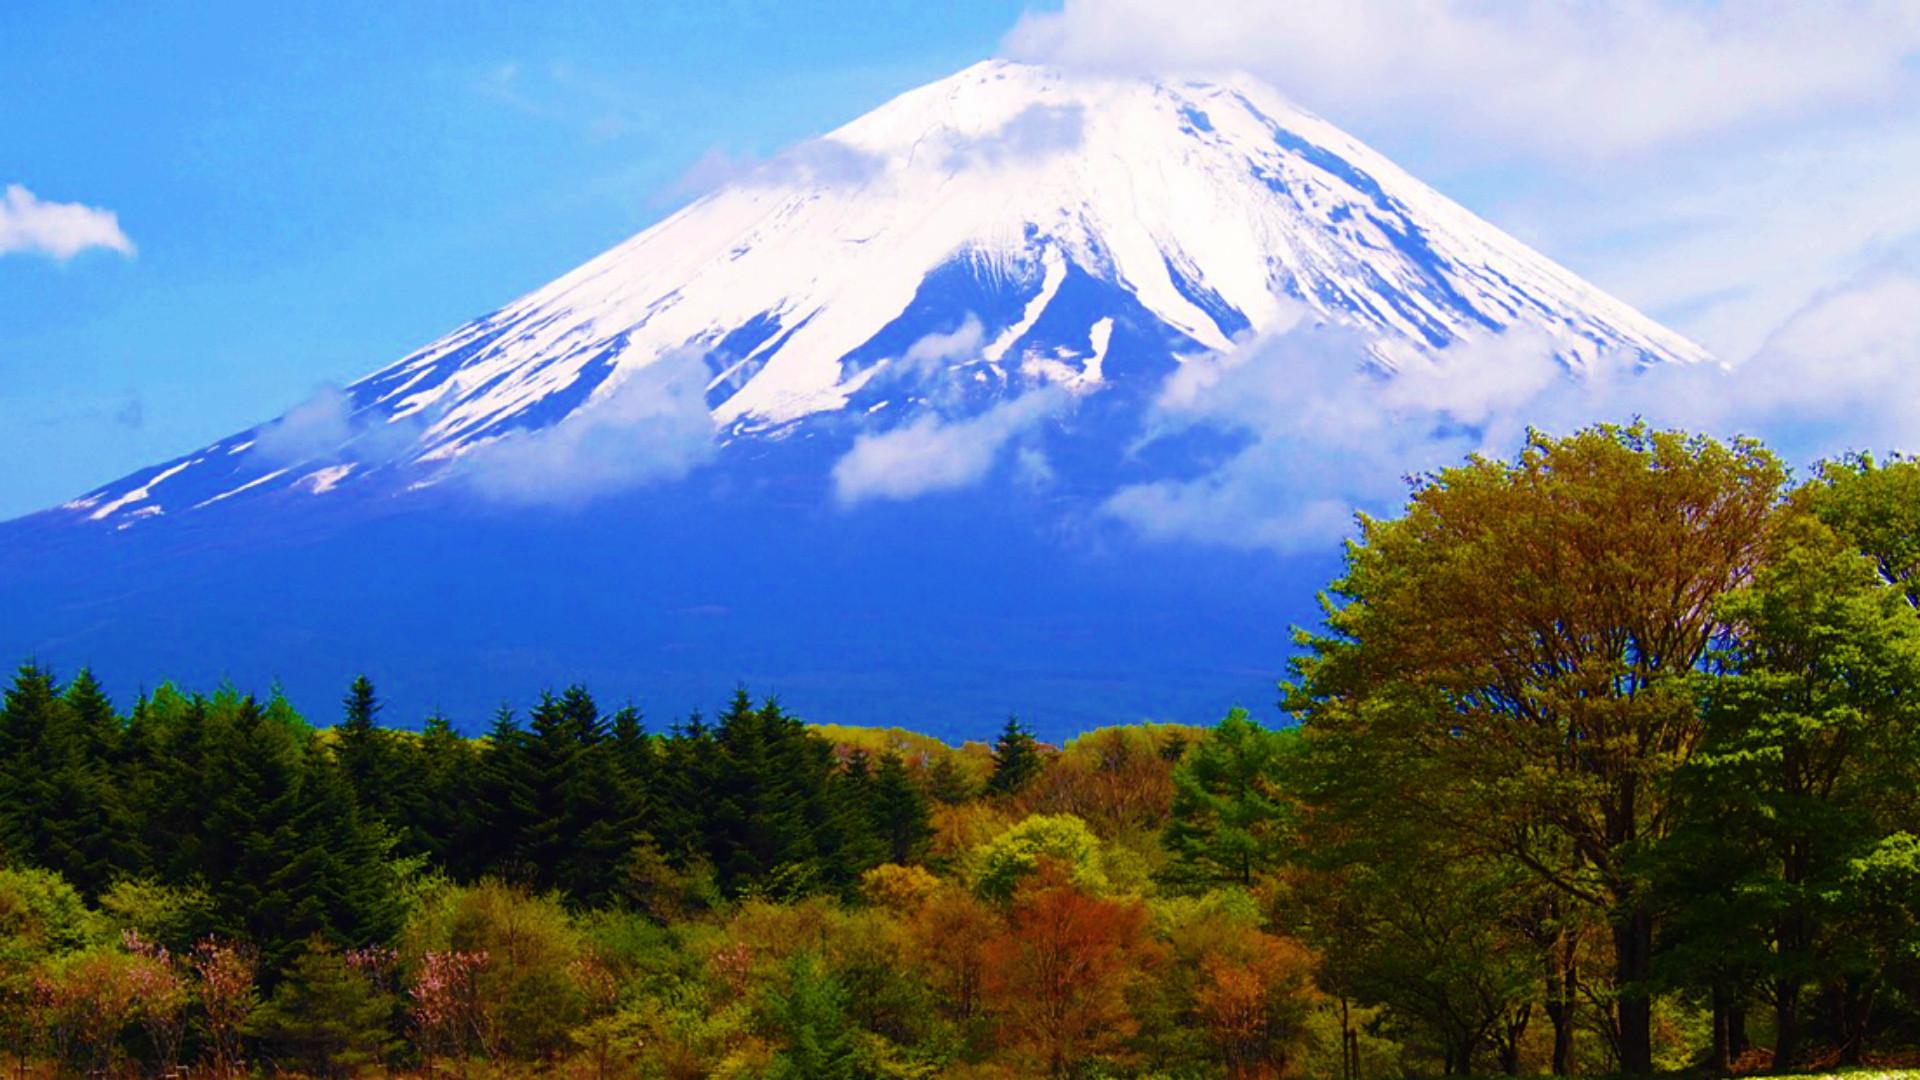 Res: 1920x1080, Mount Fuji Mountain Wallpaper